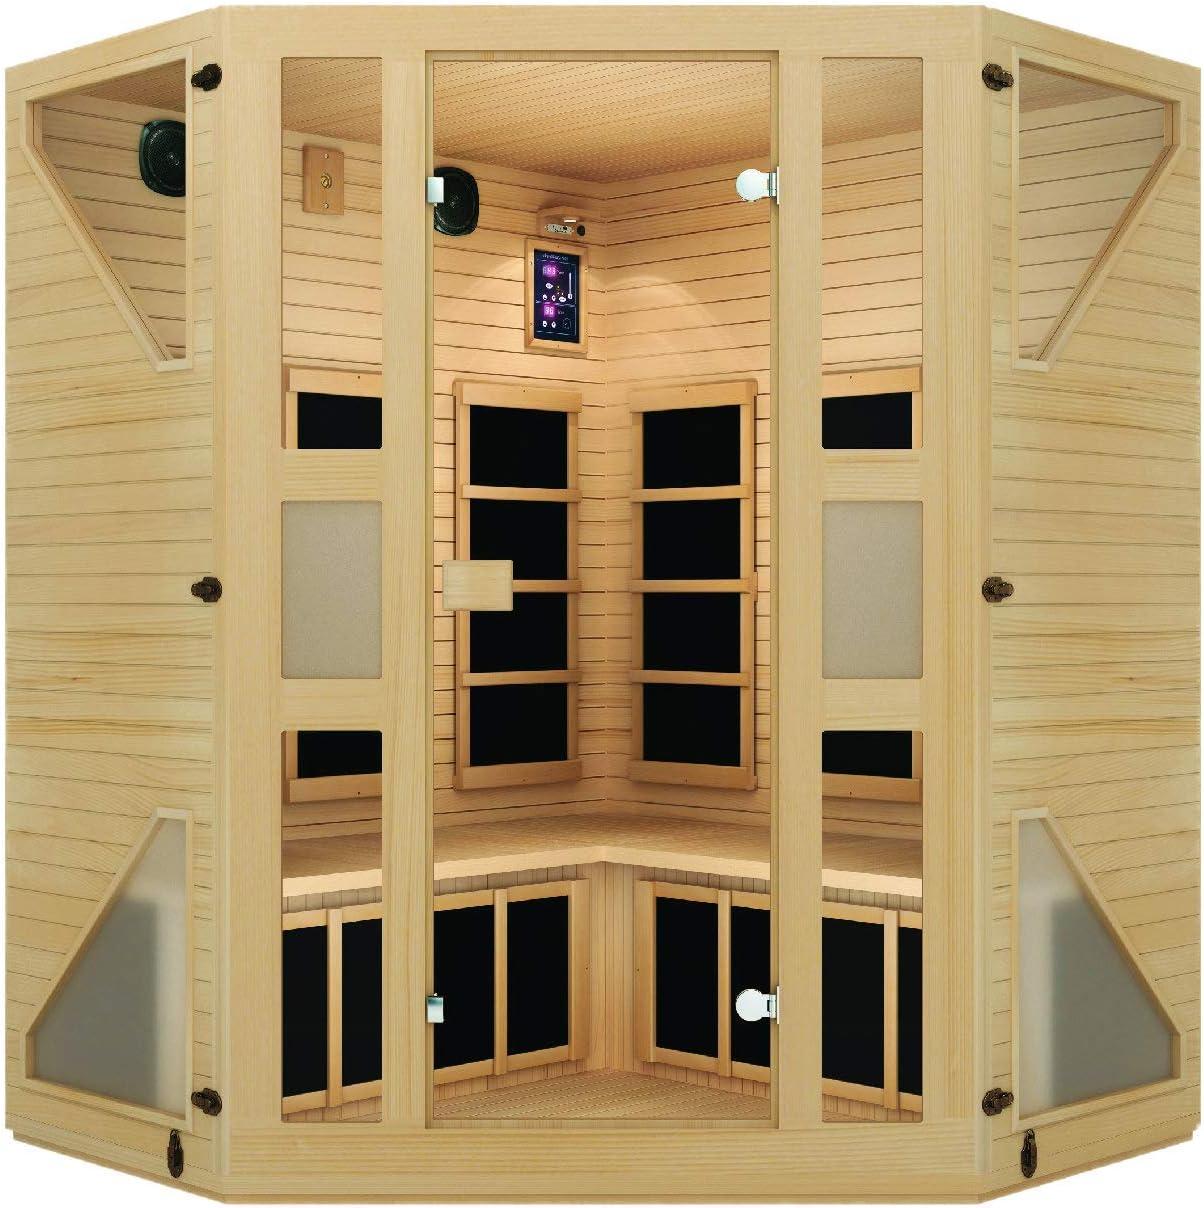 JNH Lifestyles NE4CHB1 Ensi Infrared Sauna